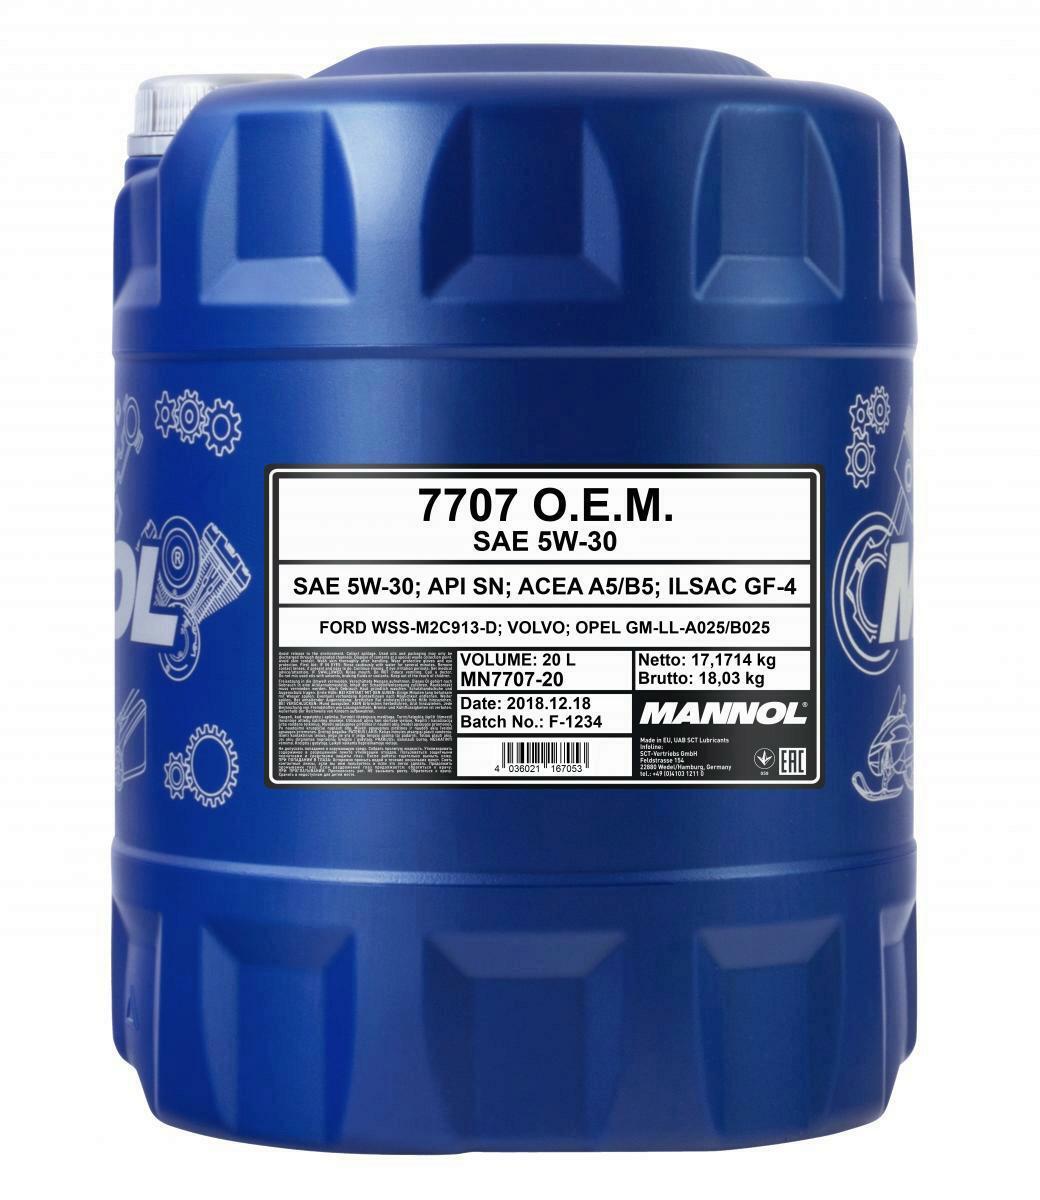 MANNOL 7707 O.E.M. 5W-30 20 Liter